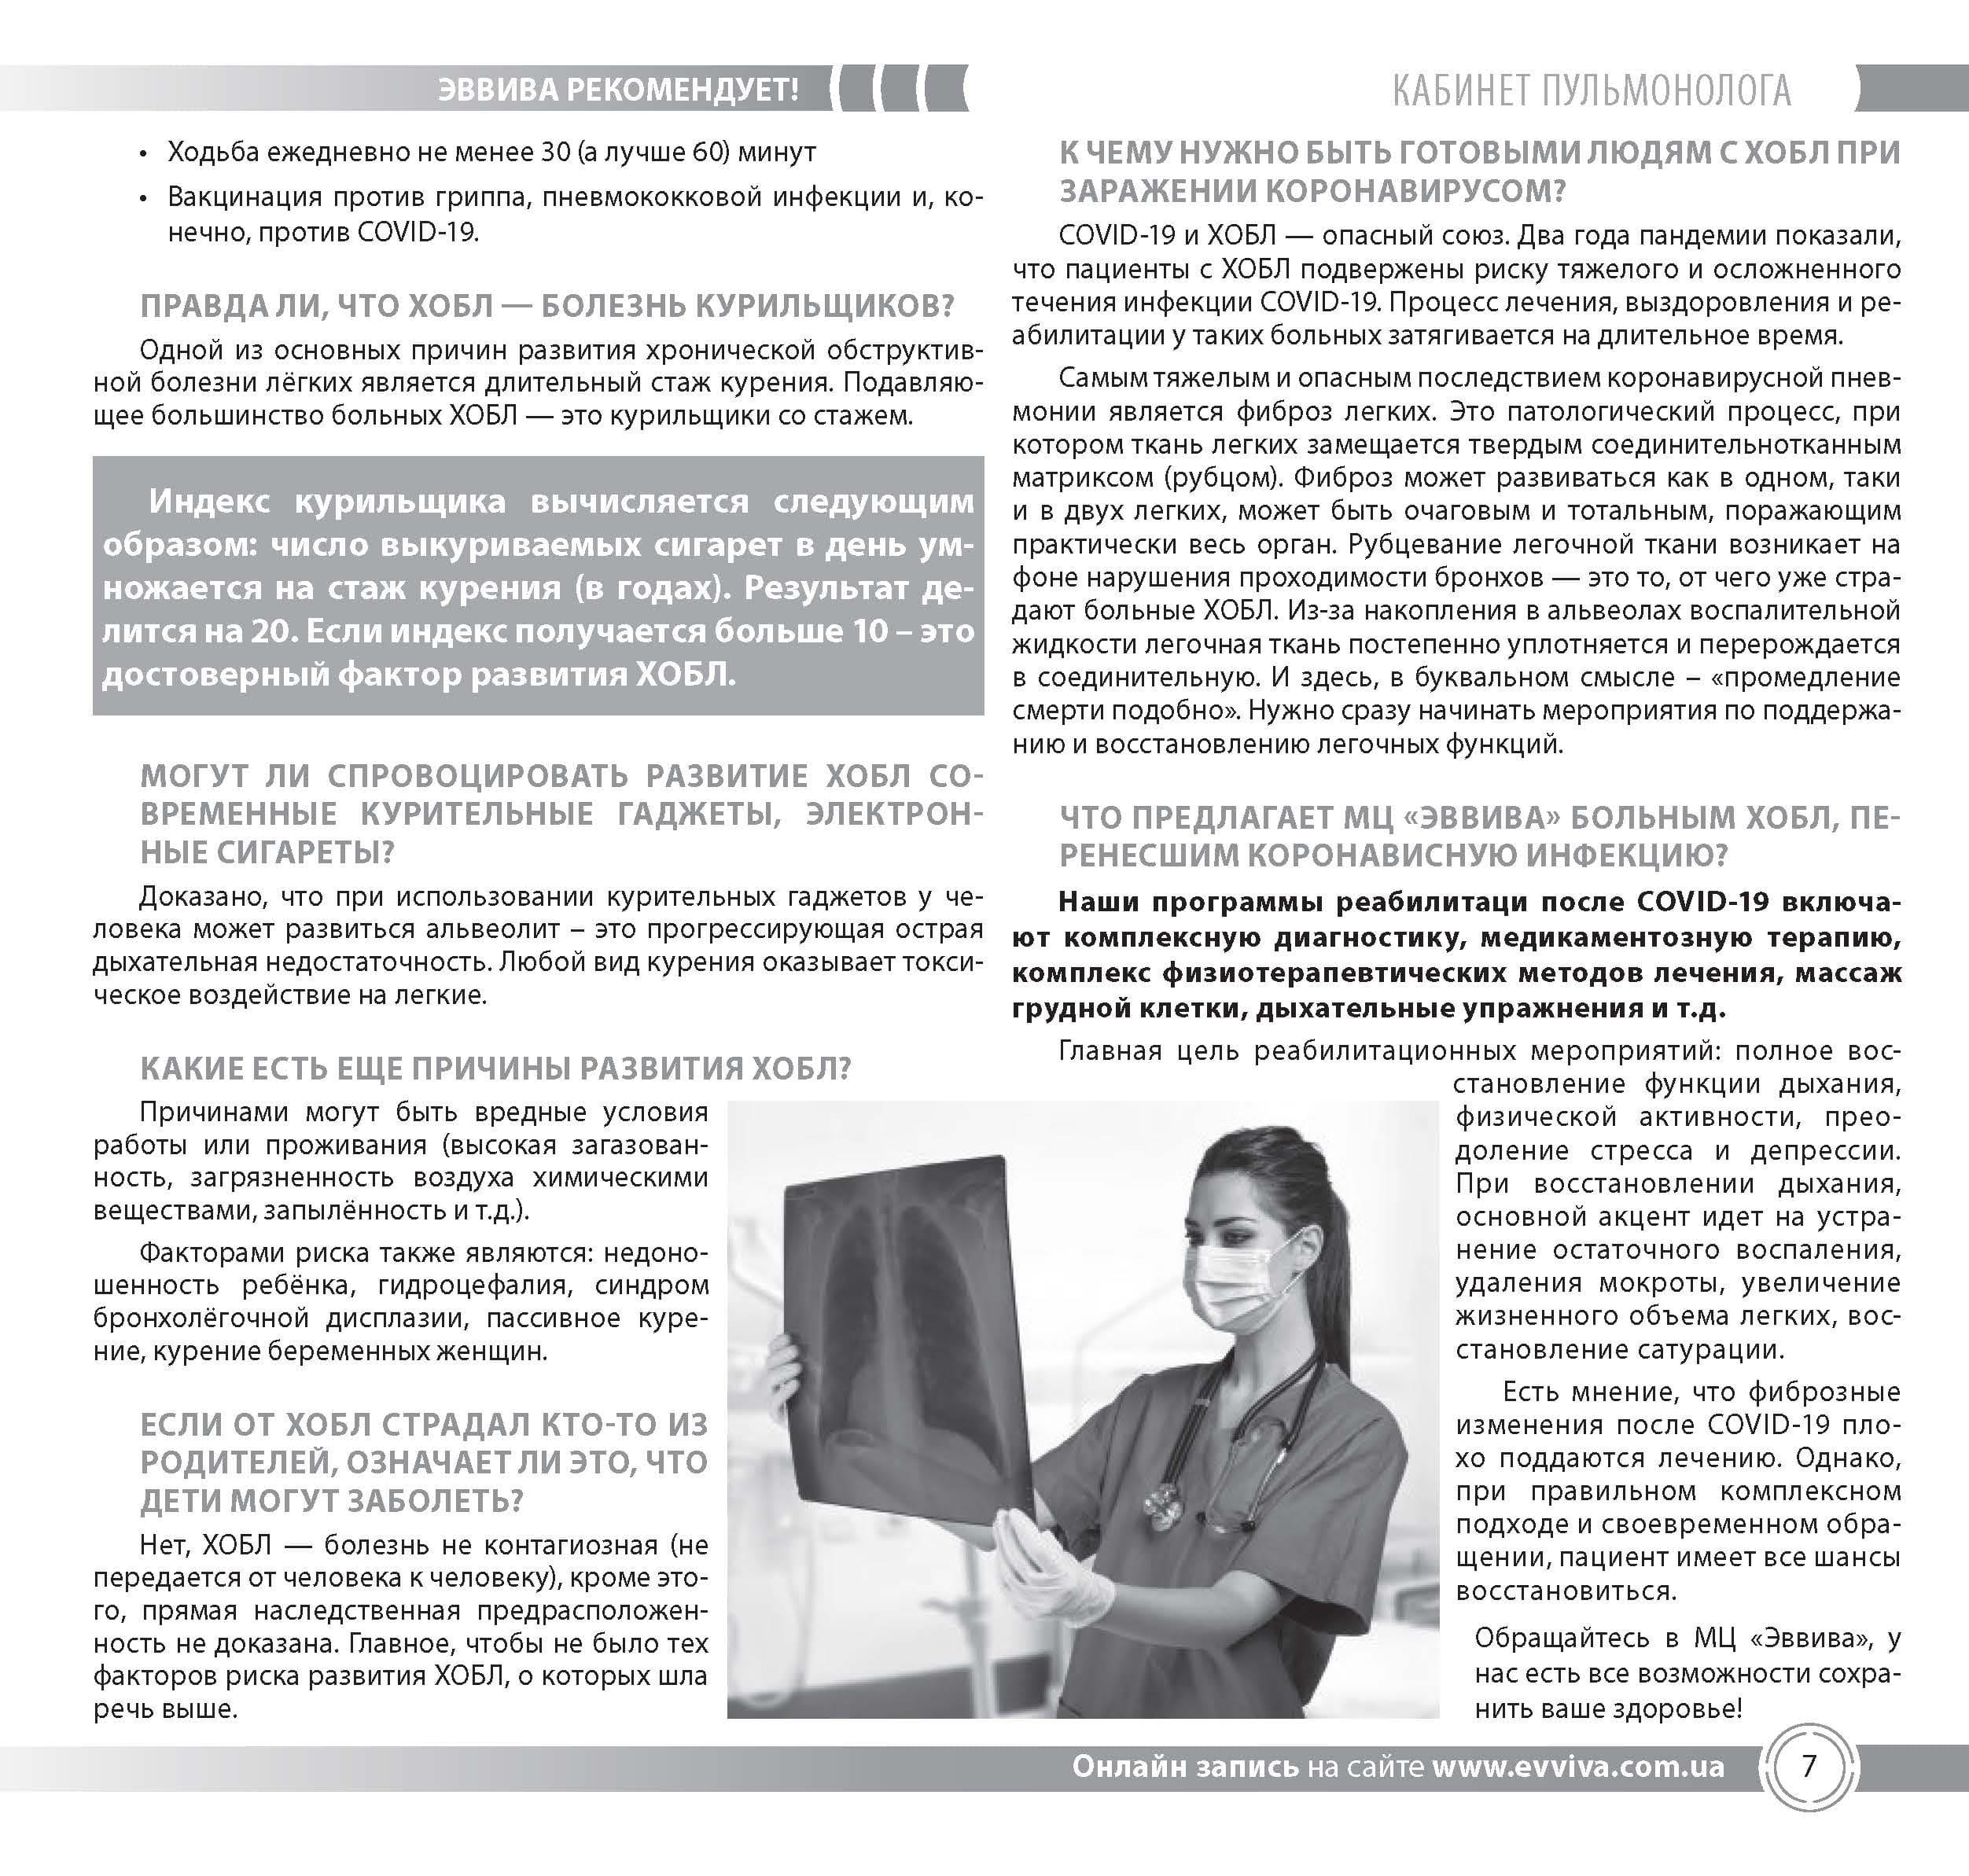 evviva-zhurnal-119-page7